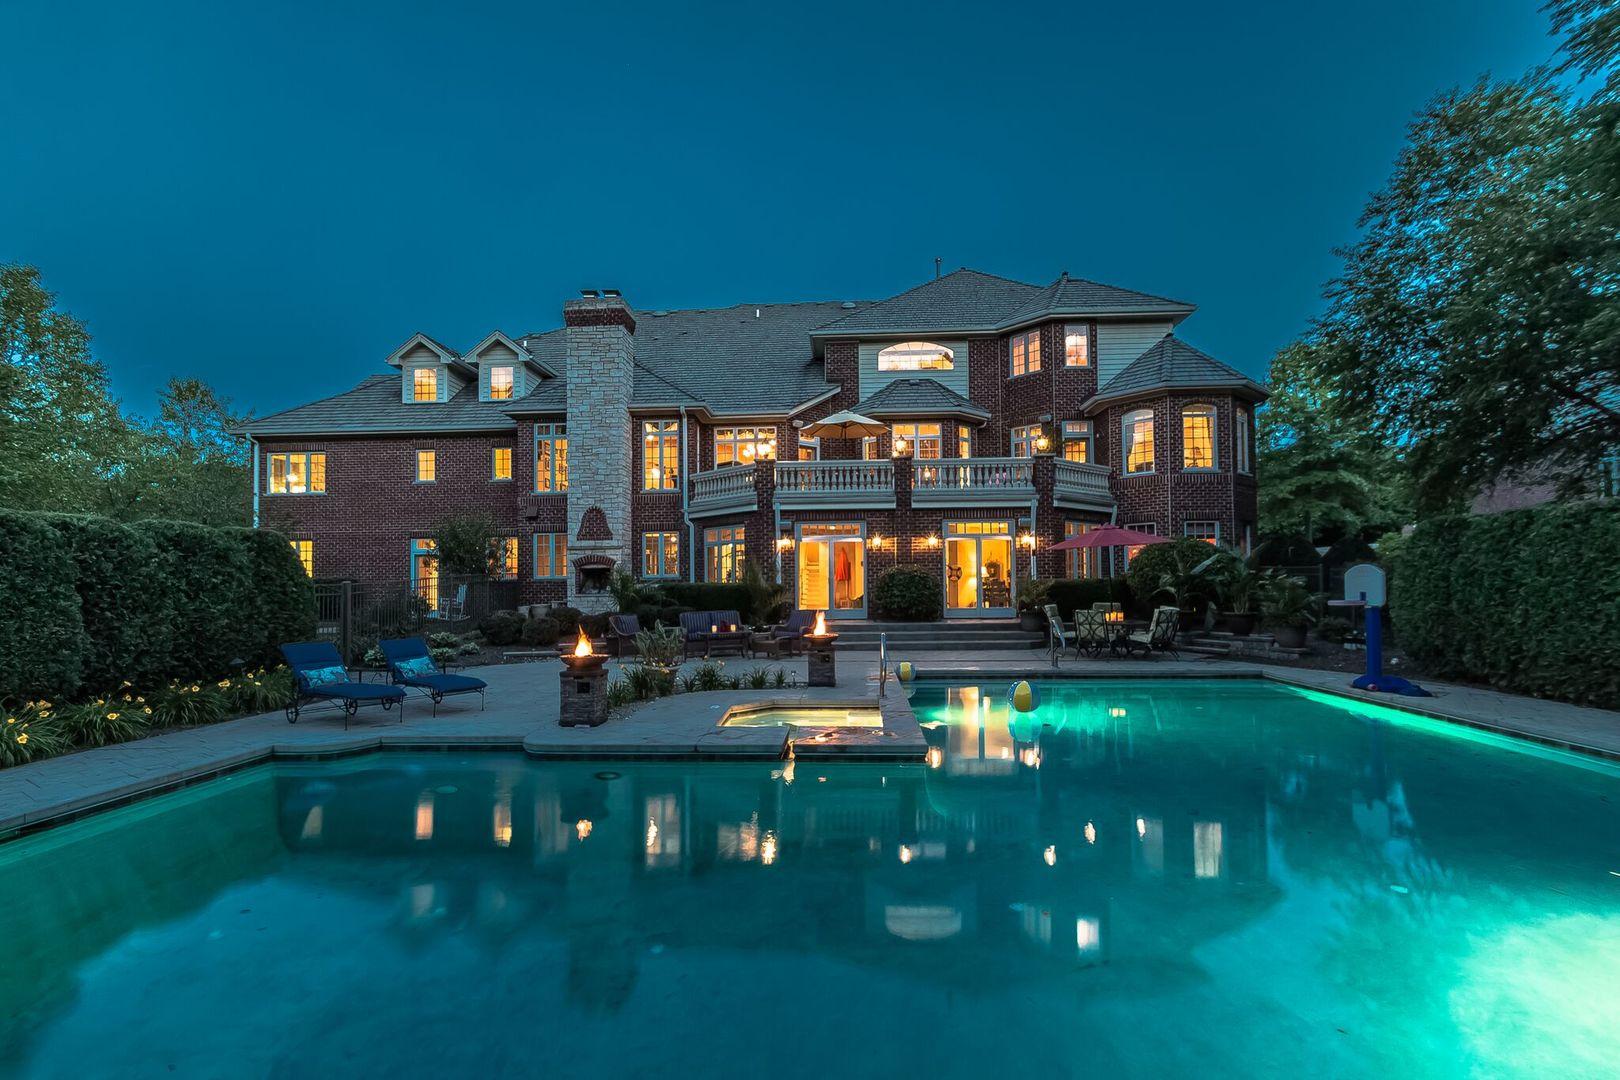 Homes for sale in the Silo Ridge subdivision | Orland Park, Illinois ...